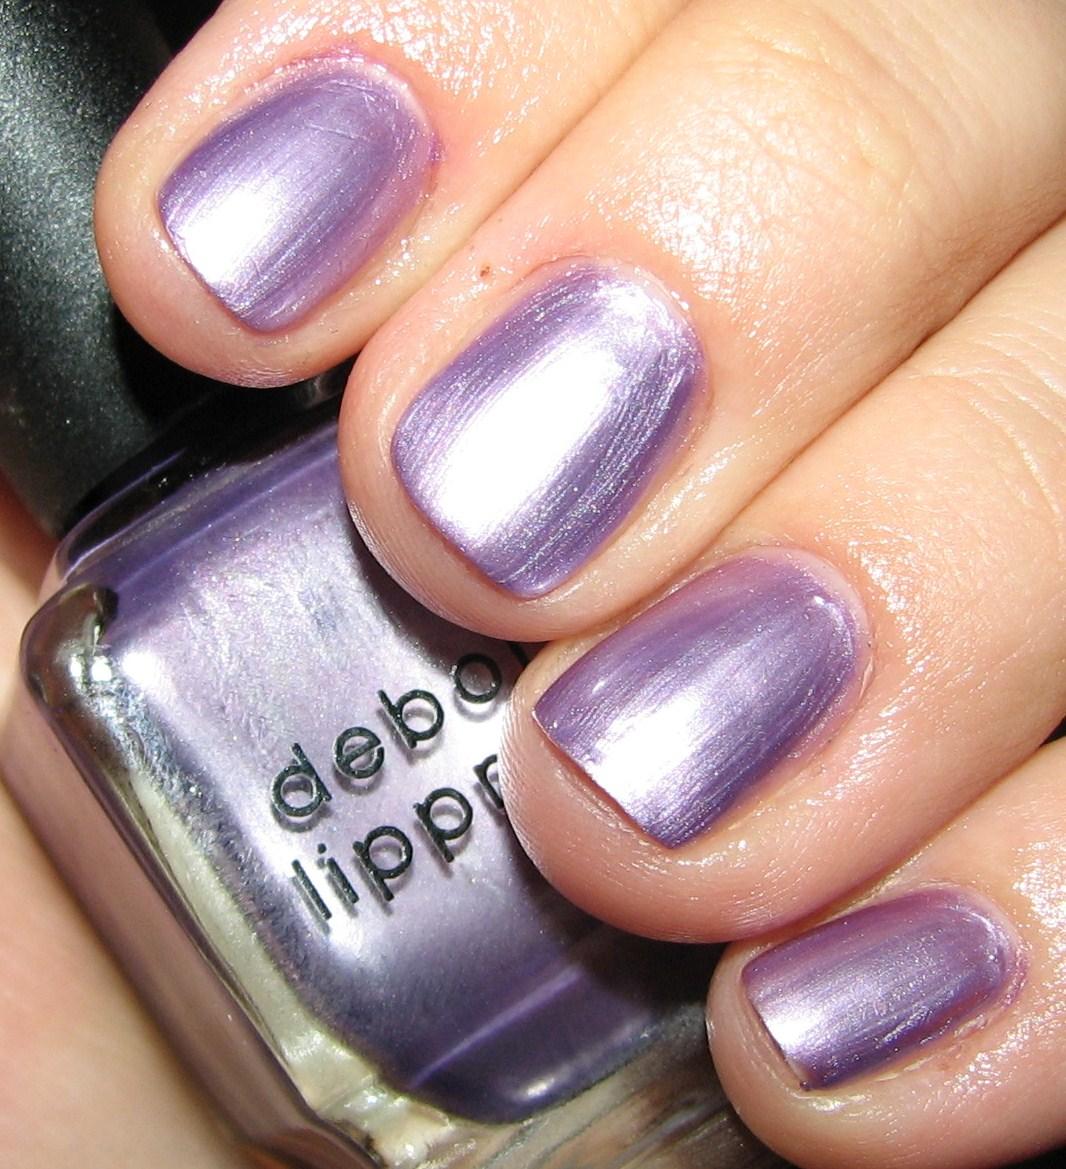 Deborah Lippmann PURPLE RAIN Nail Polish Swatches and Review ...